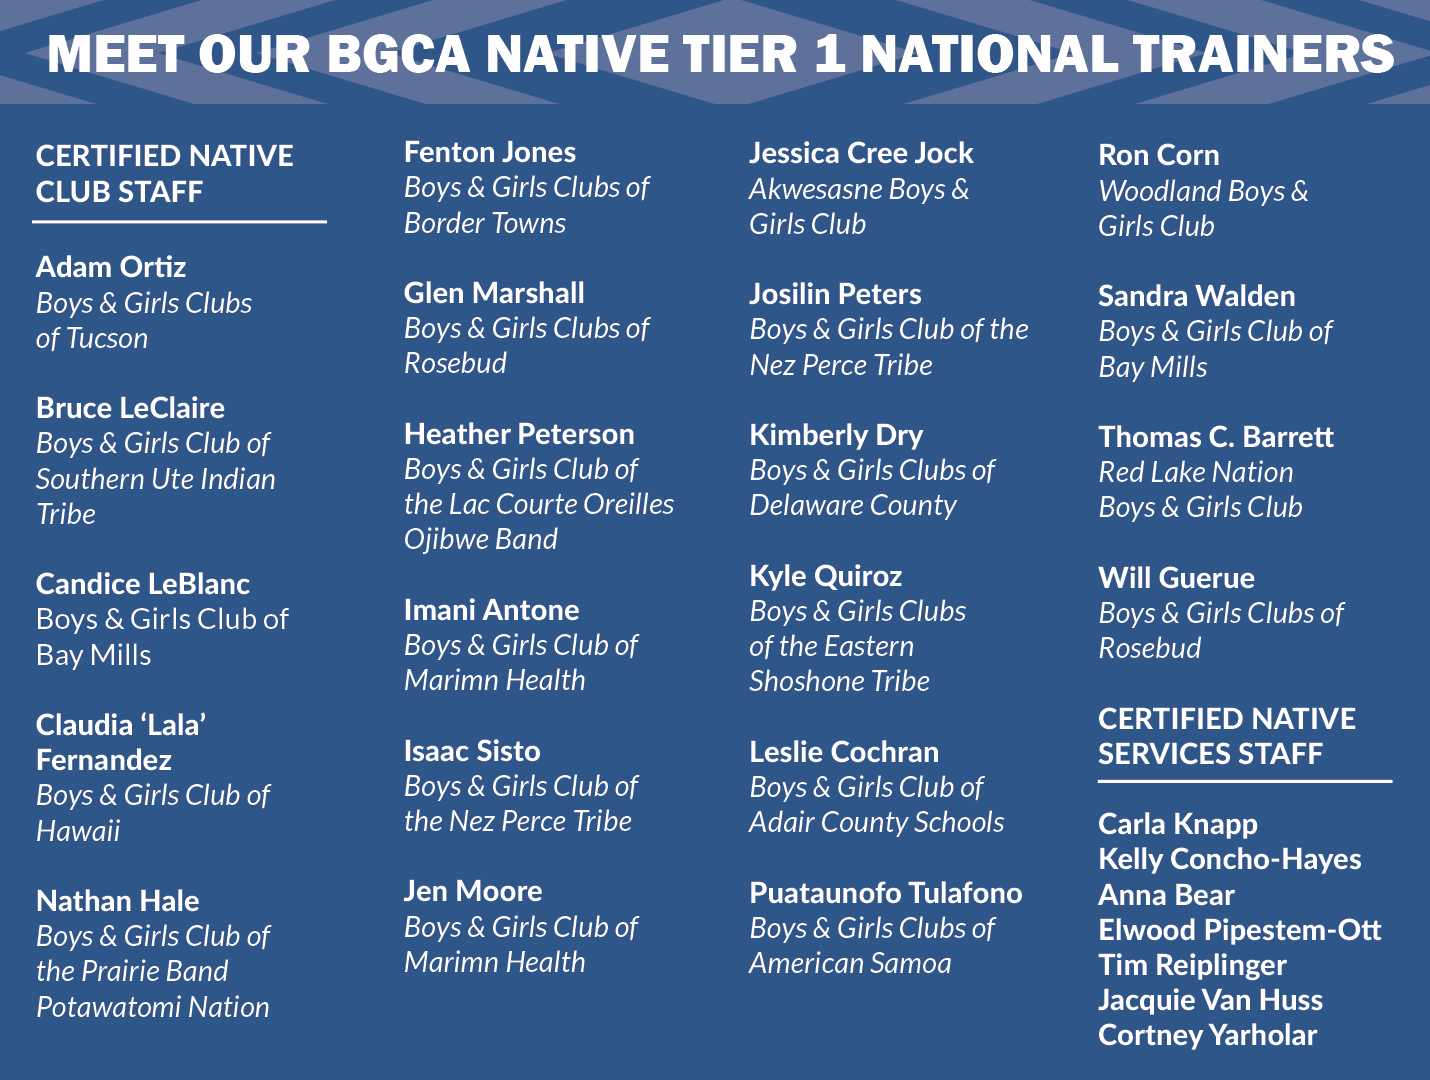 BGCA Native Tier 1 Trainers